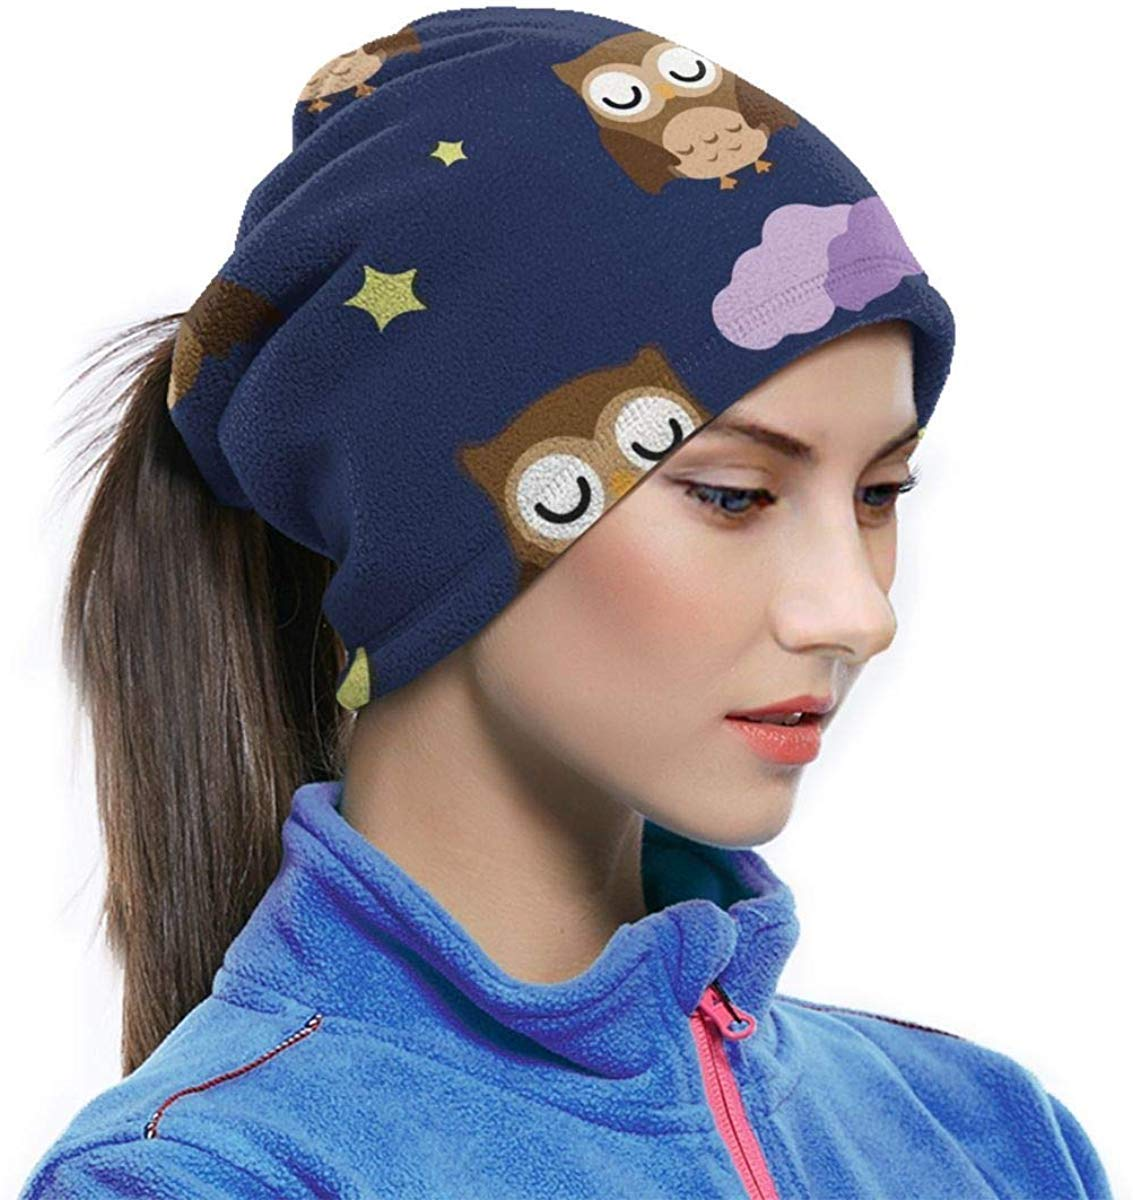 Beautiful home 1 Microfiber Neck Warmer Nebula Moon Night Owl Neck Gaiter Tube Ear Warmer Headband Scarf Face Mask Balaclava Black